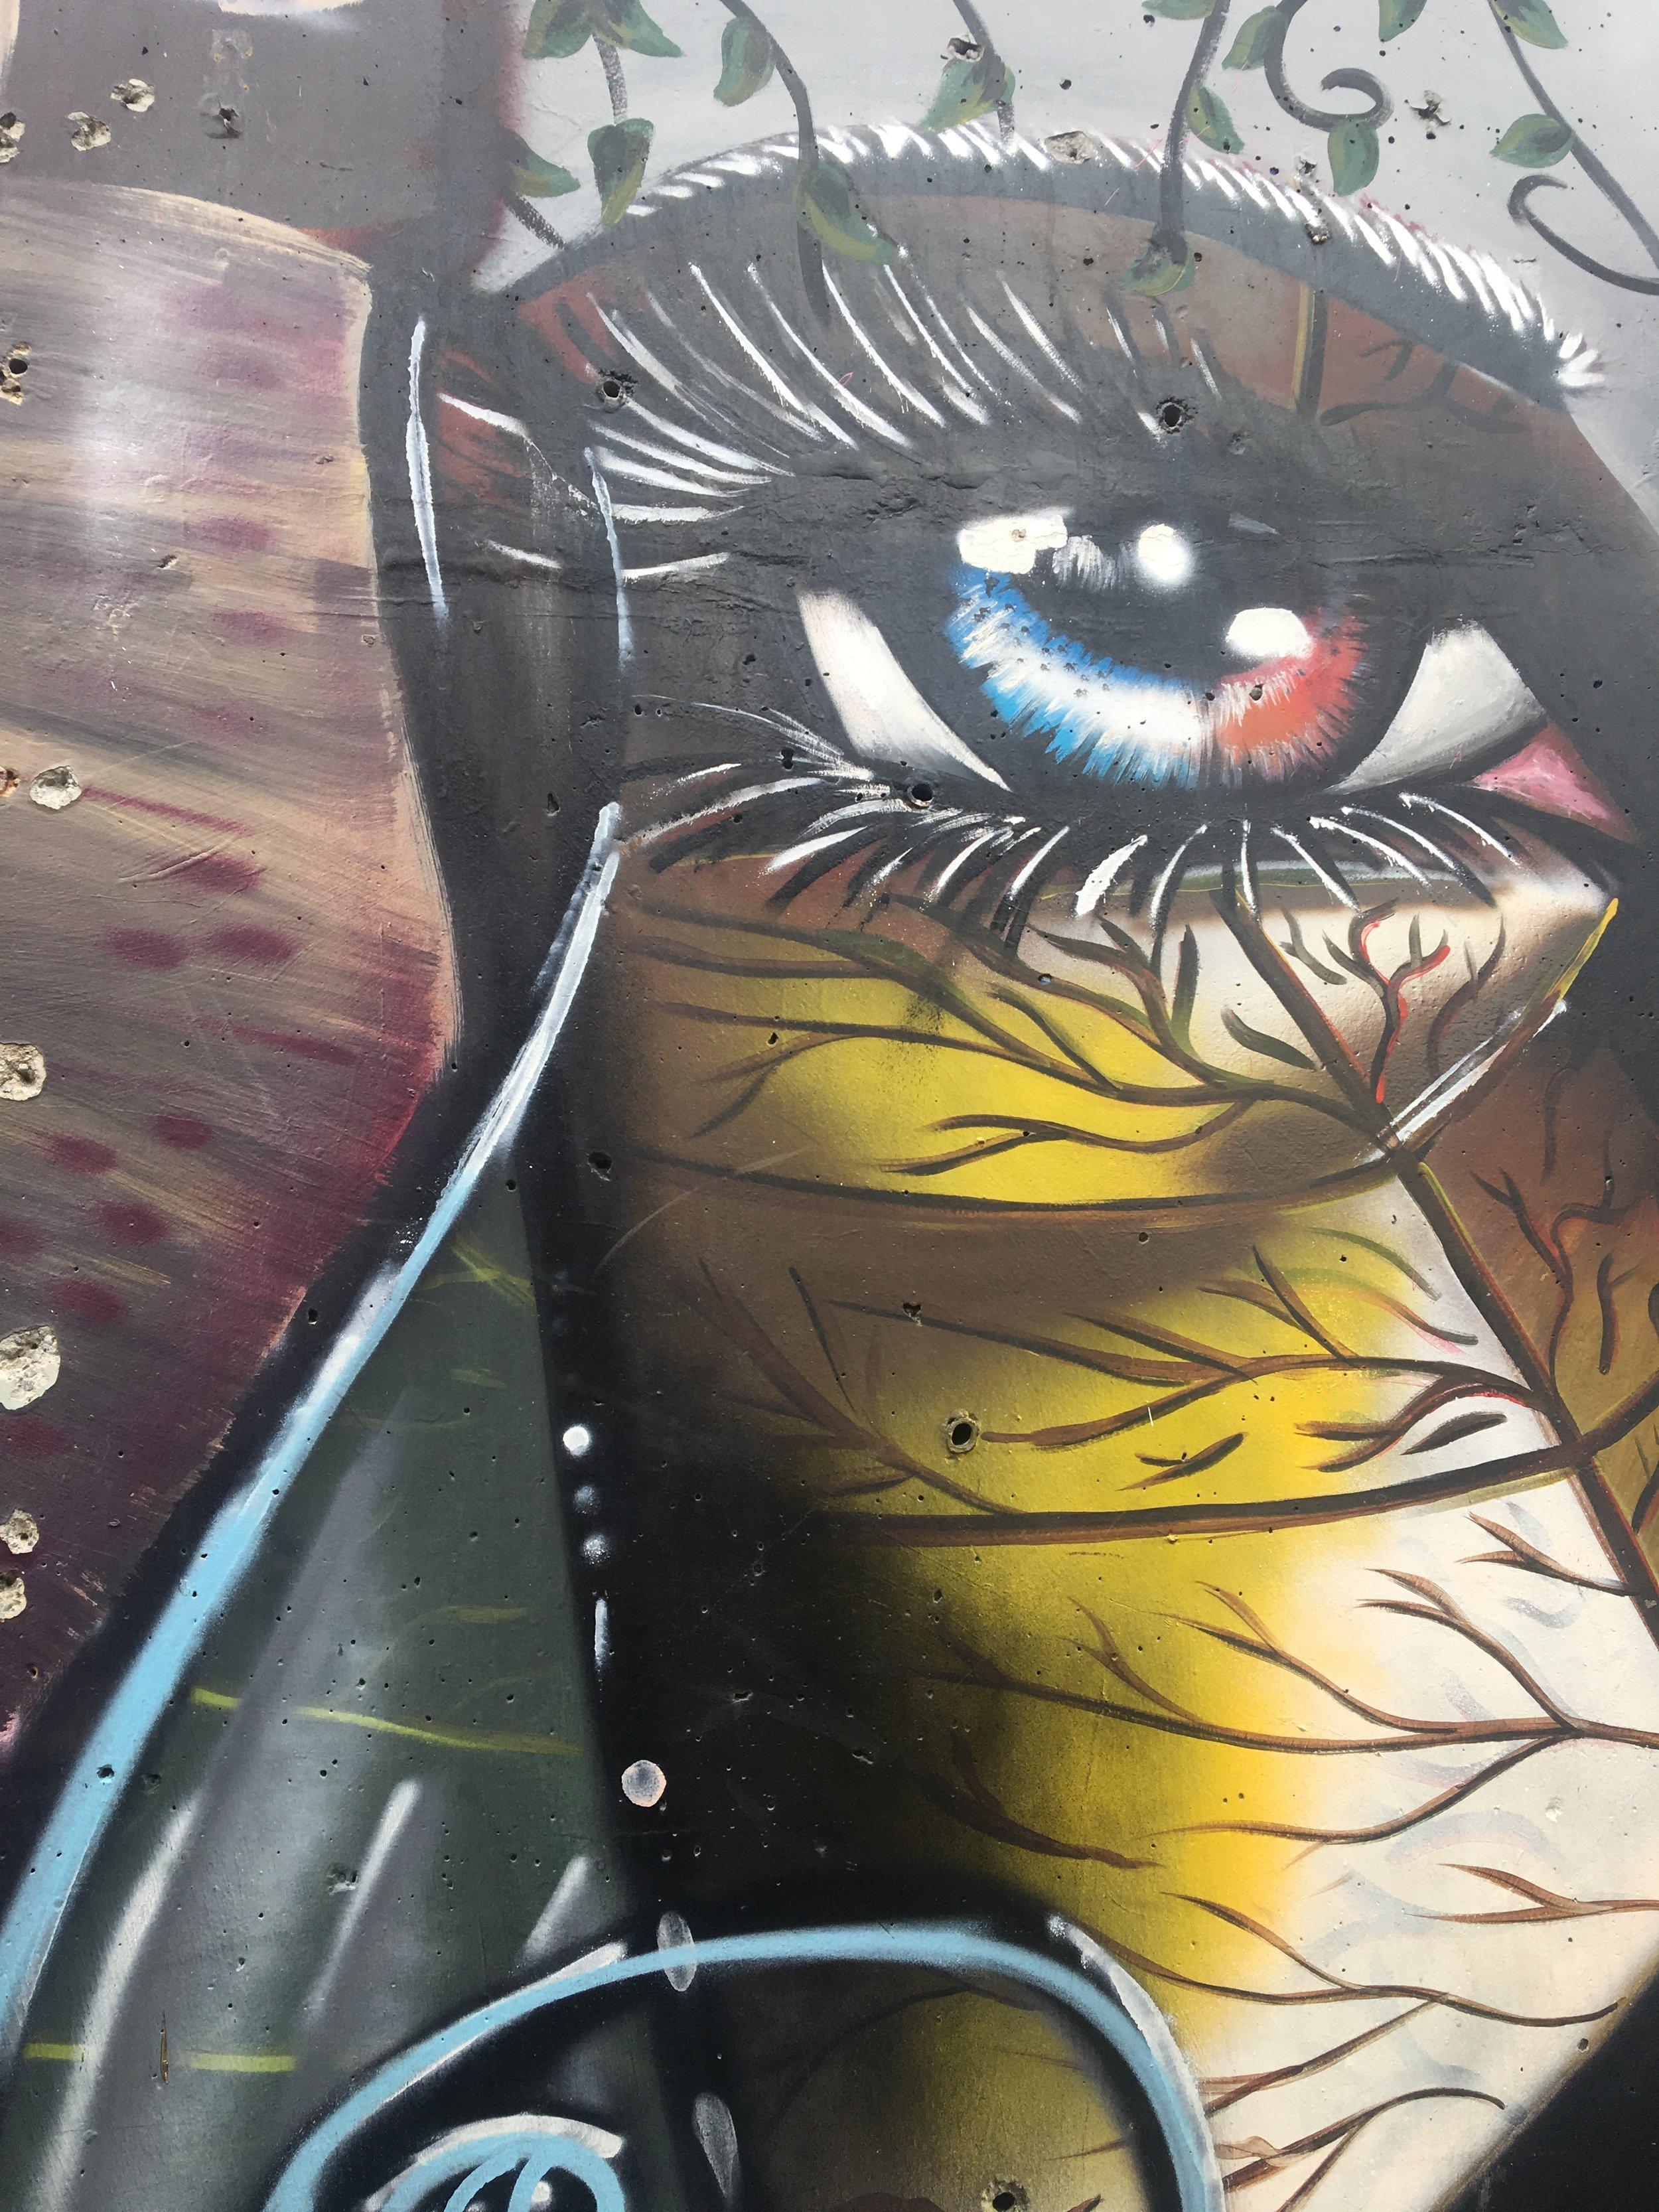 Streetart in Medellin